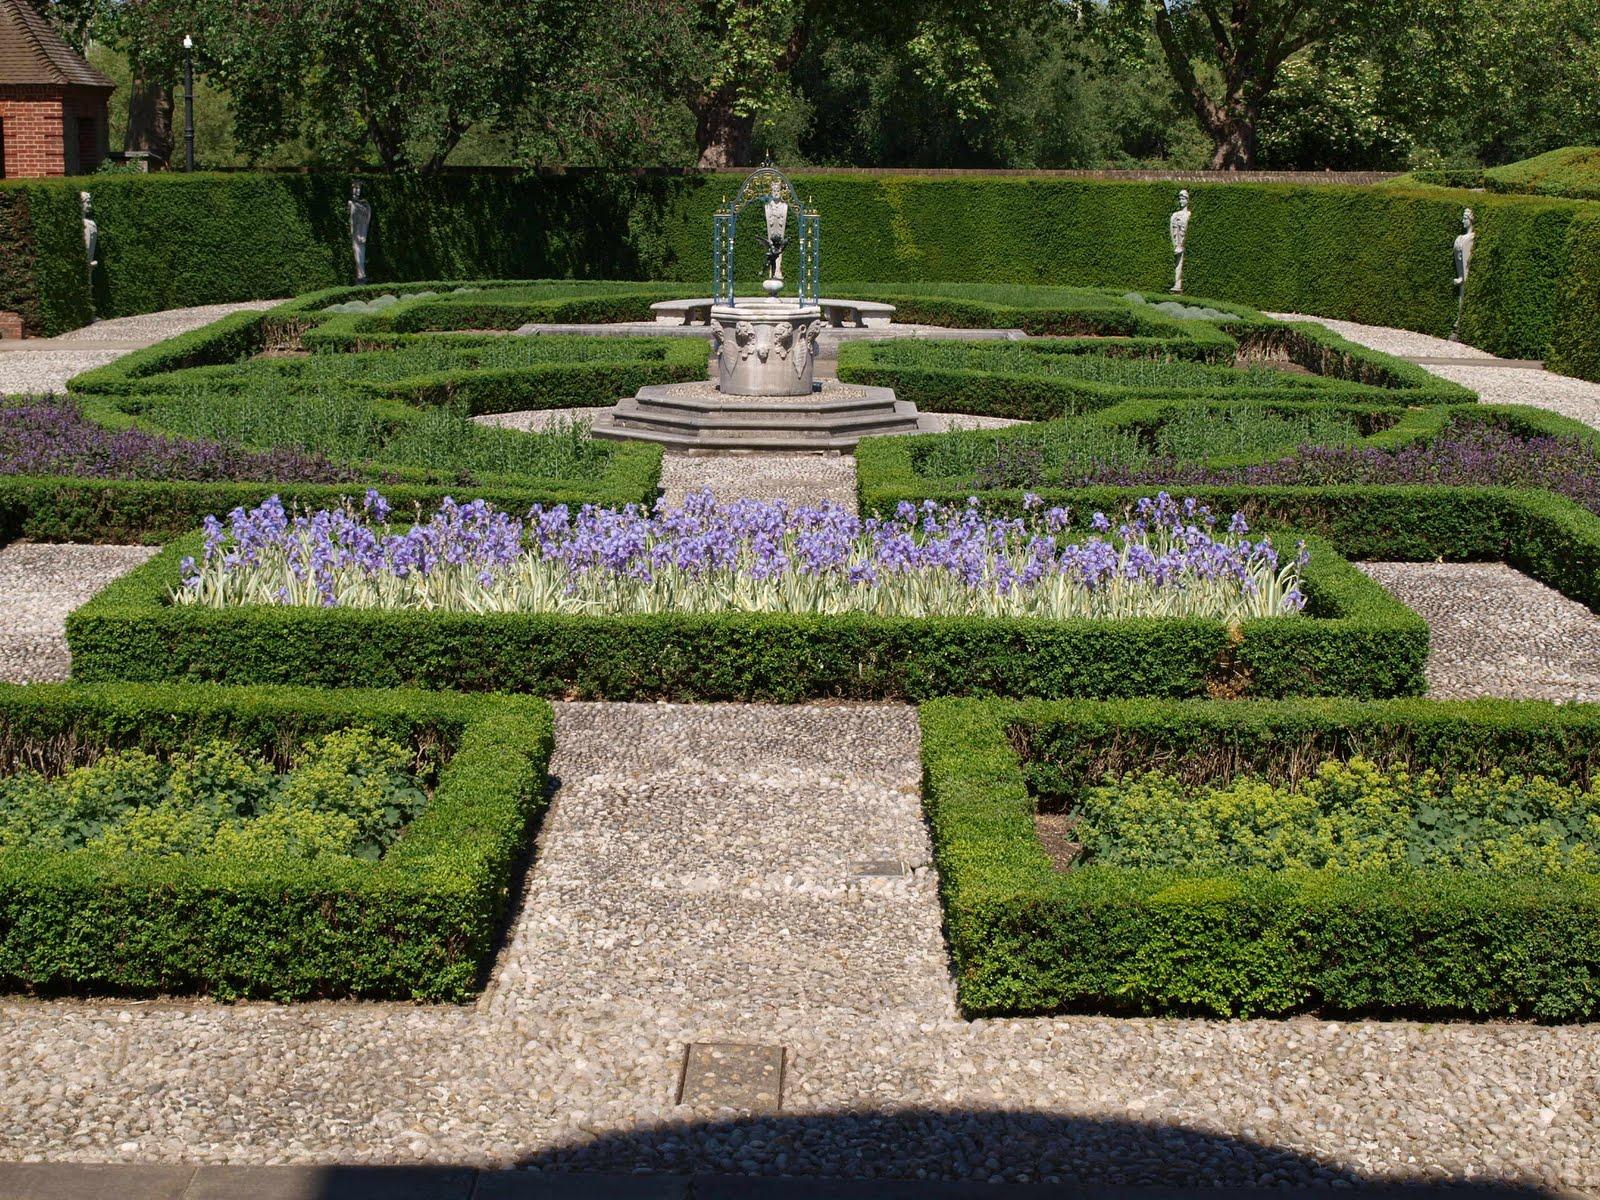 My Cottage Garden: Kew Gardens, London, England